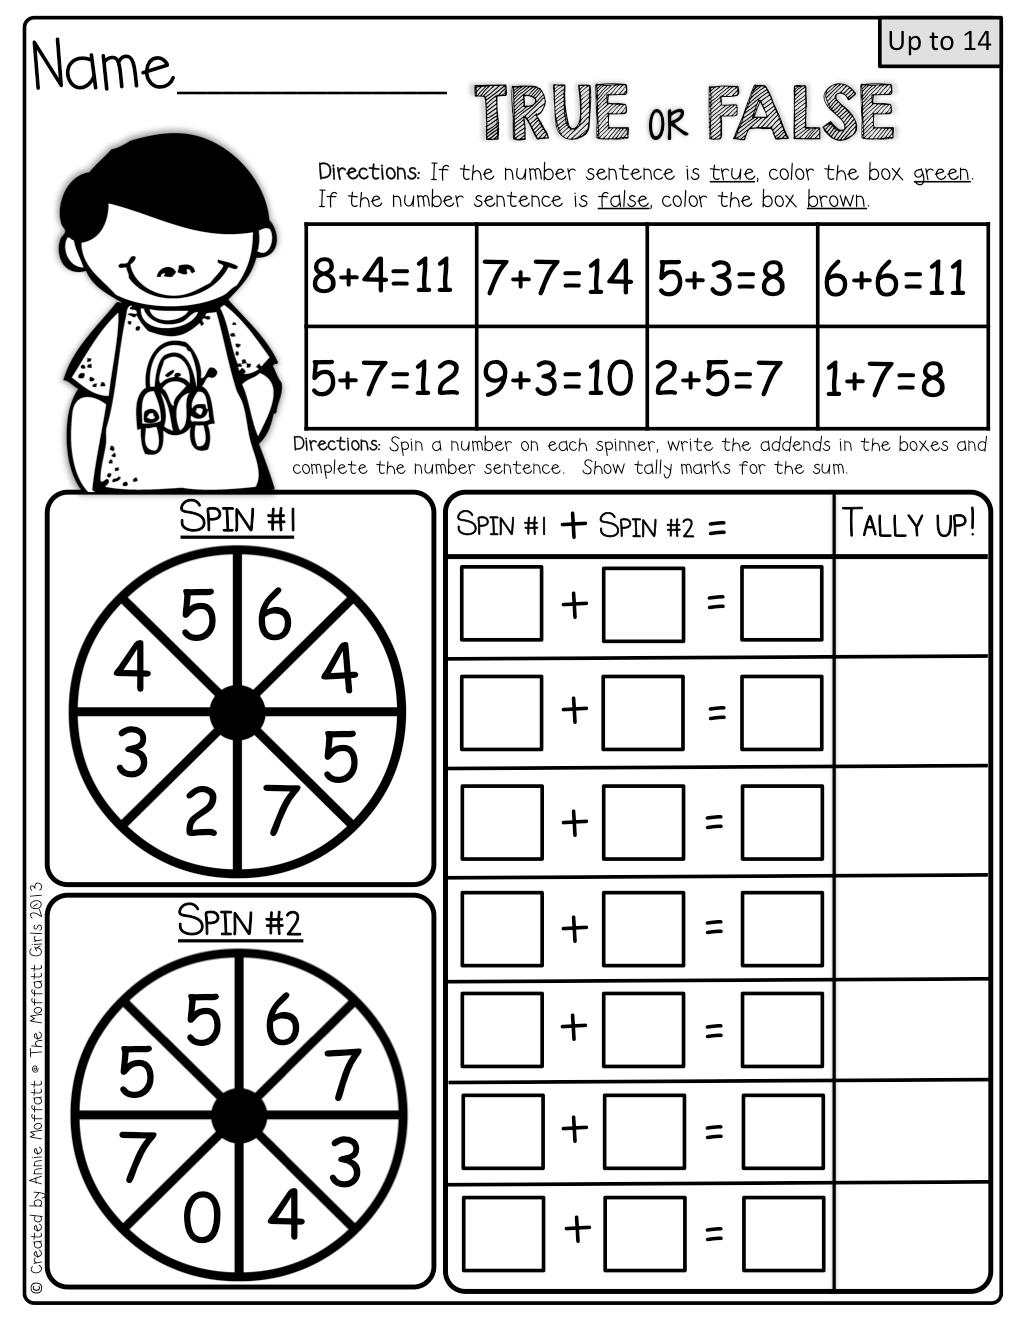 Interactive Math! FUN activities to help master simple